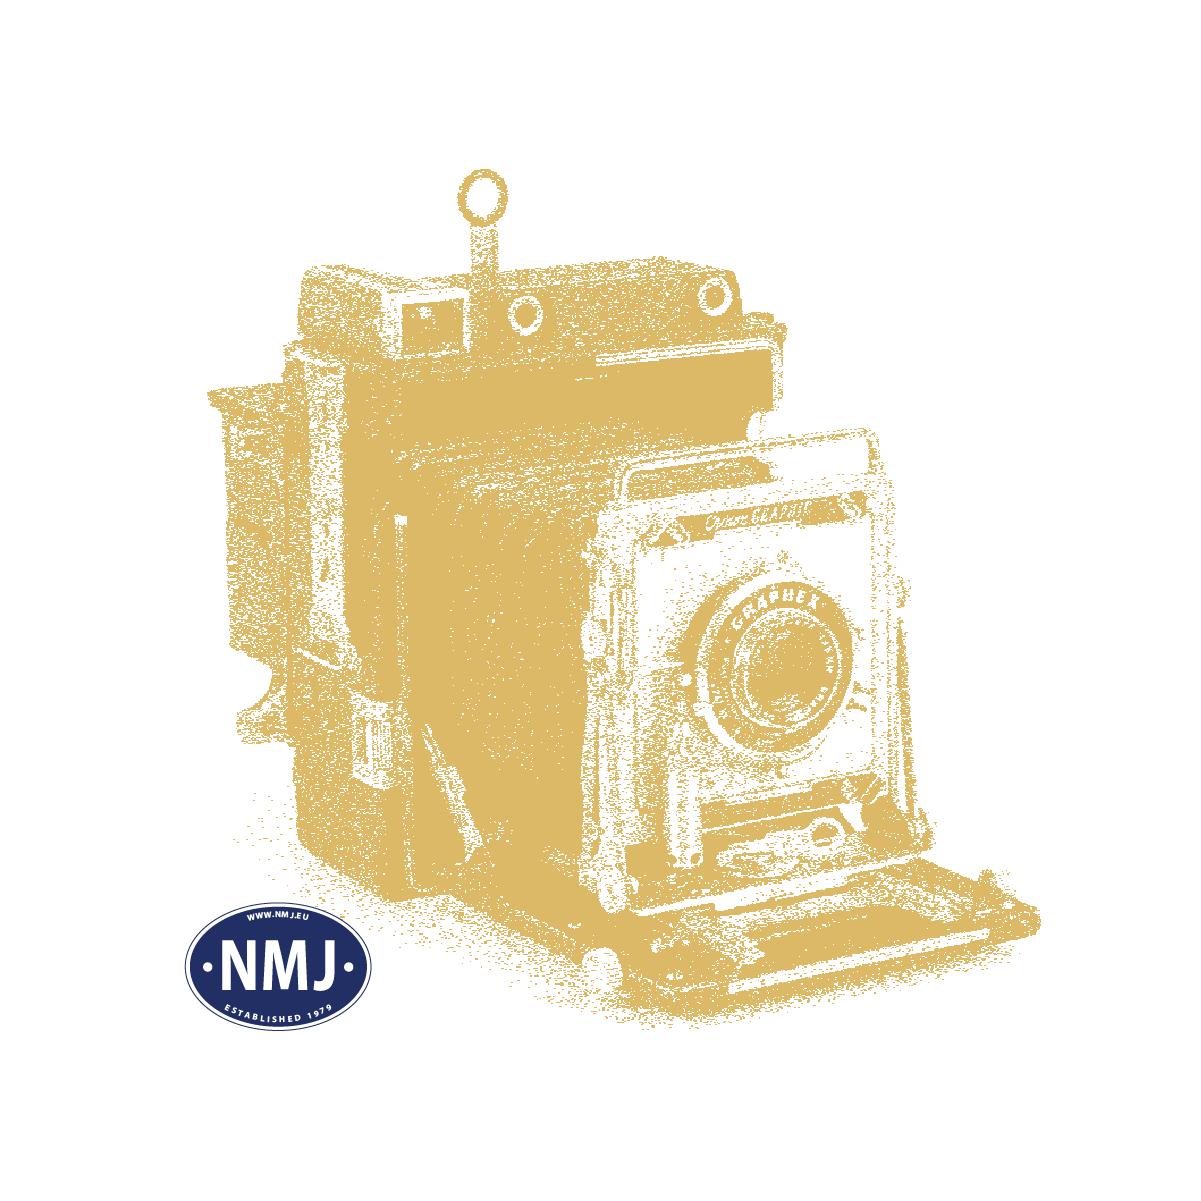 NMJT86.201AC - NMJ Topline NSB El11.2107, rotbraun, AC Digital